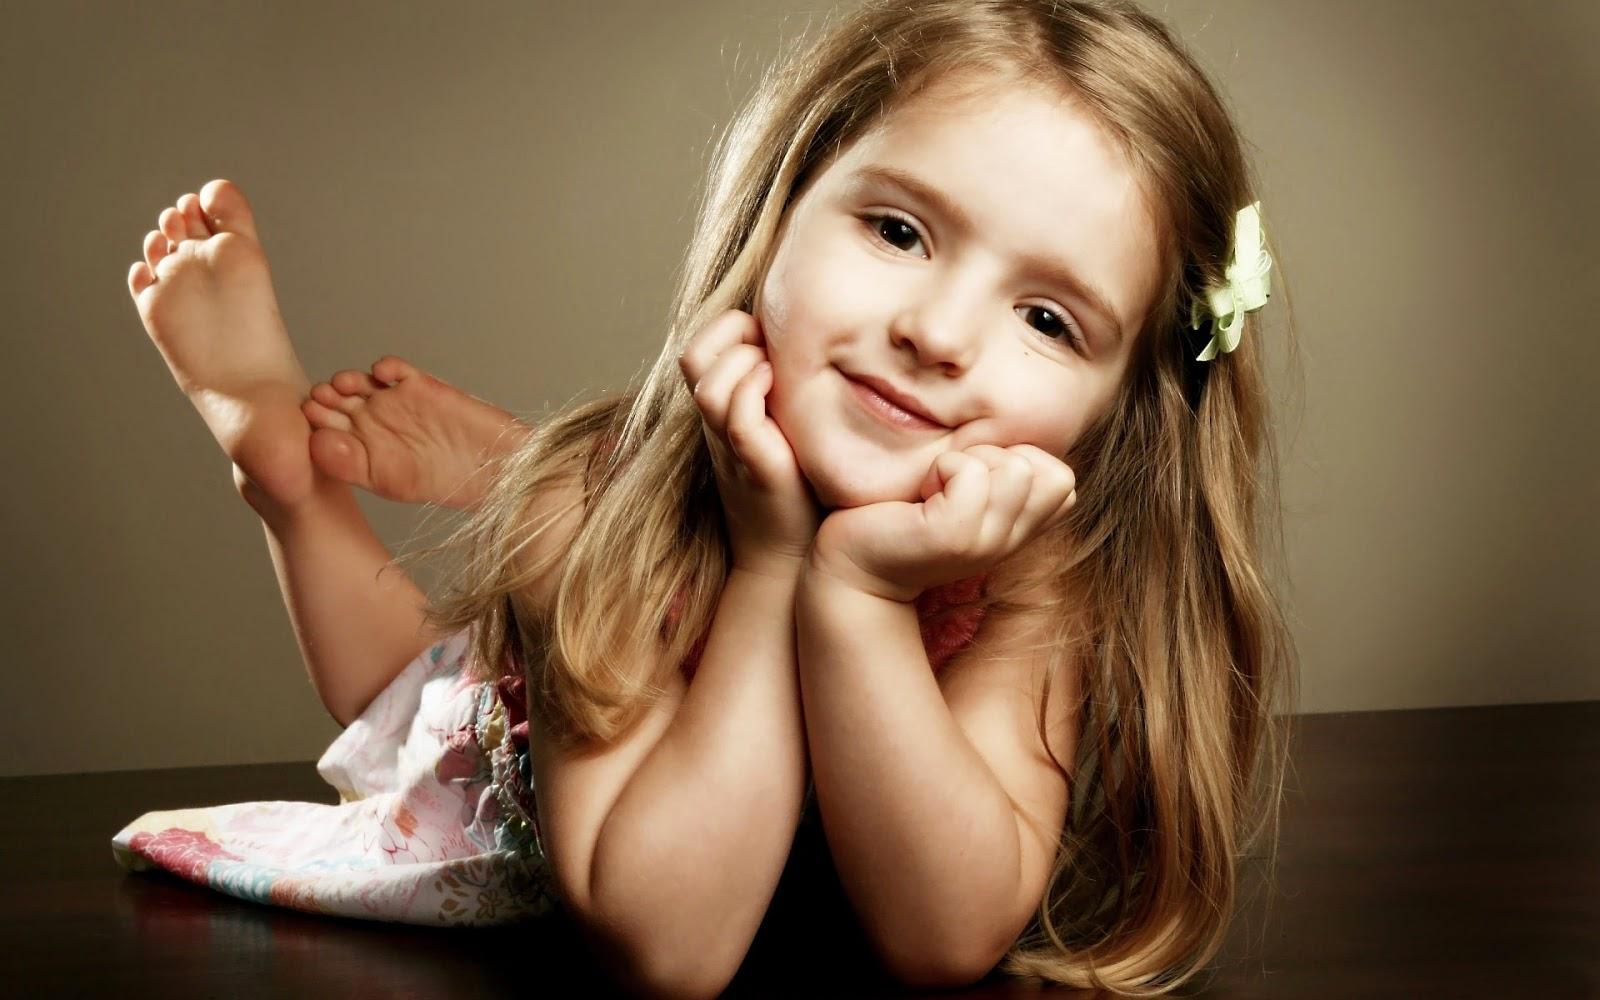 Girl Pretty Cute